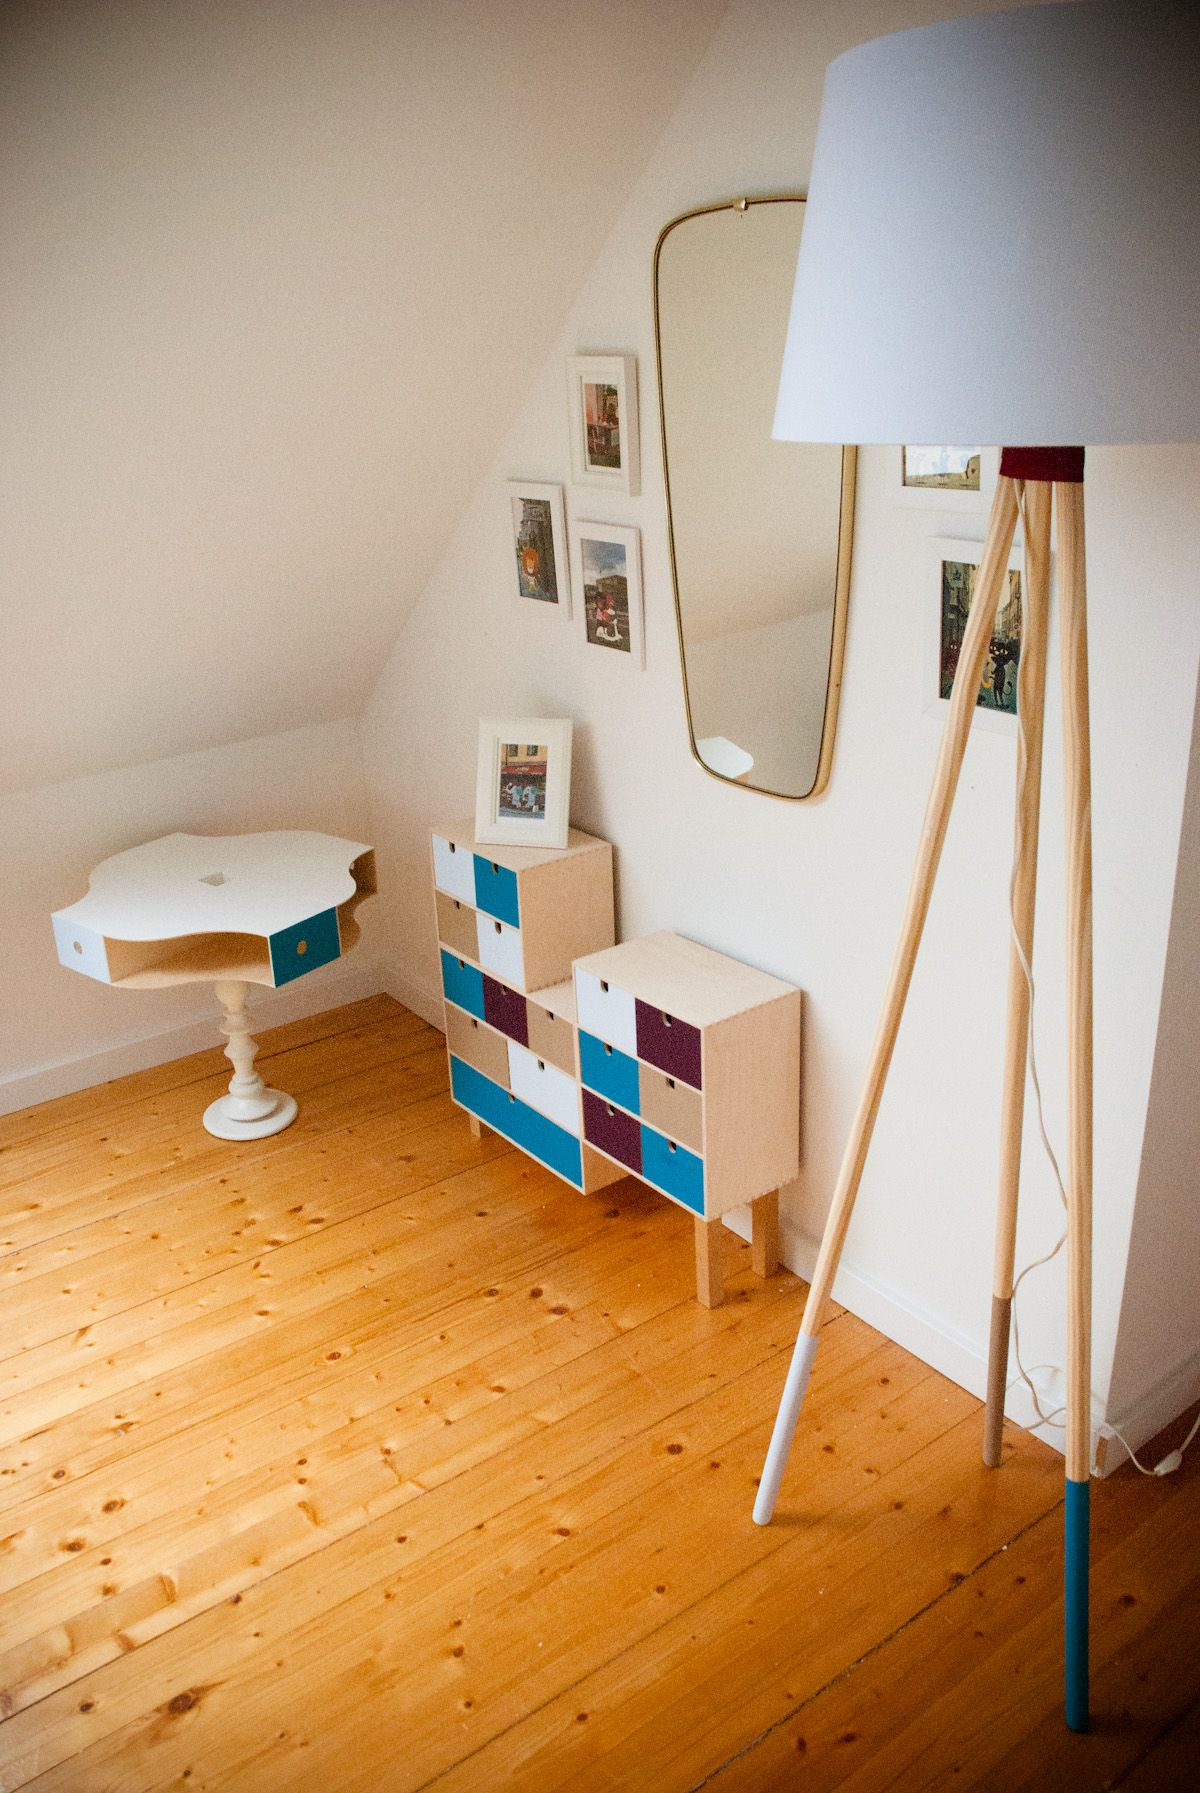 ikea hack wohnung pinterest diy m bel ikea und ikea m bel. Black Bedroom Furniture Sets. Home Design Ideas